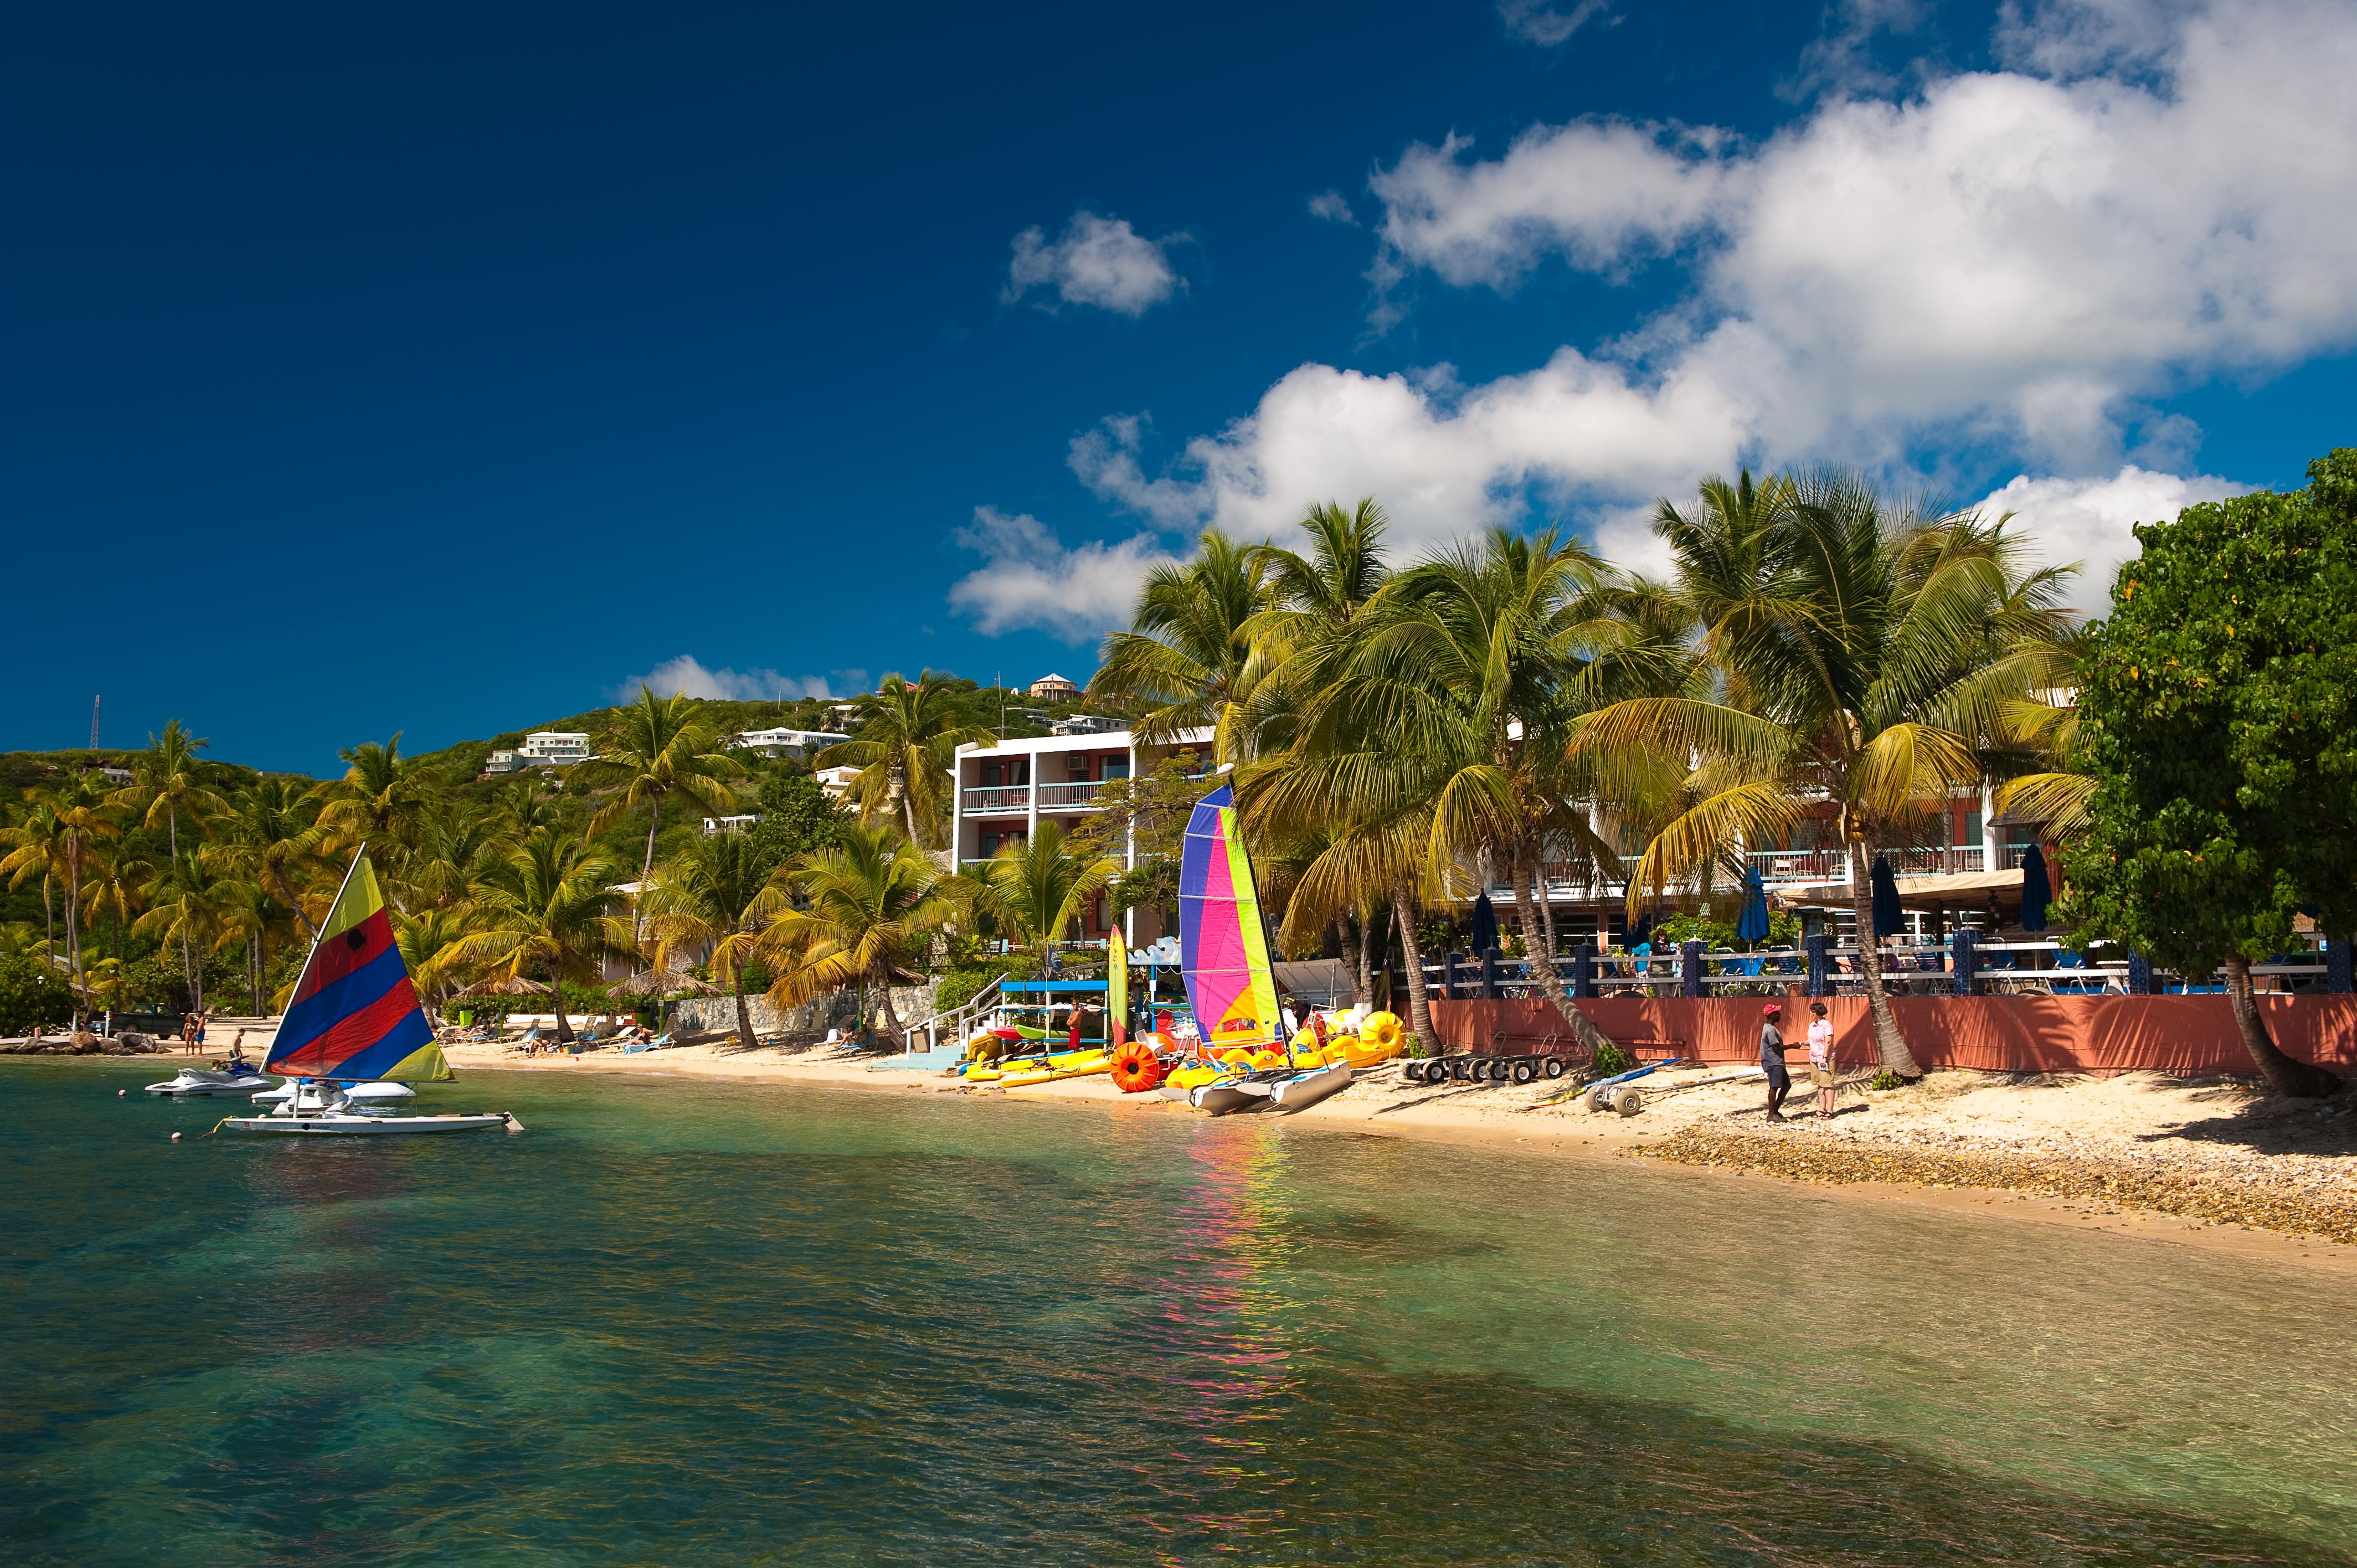 Bolongo Bay Beach Resort Installs